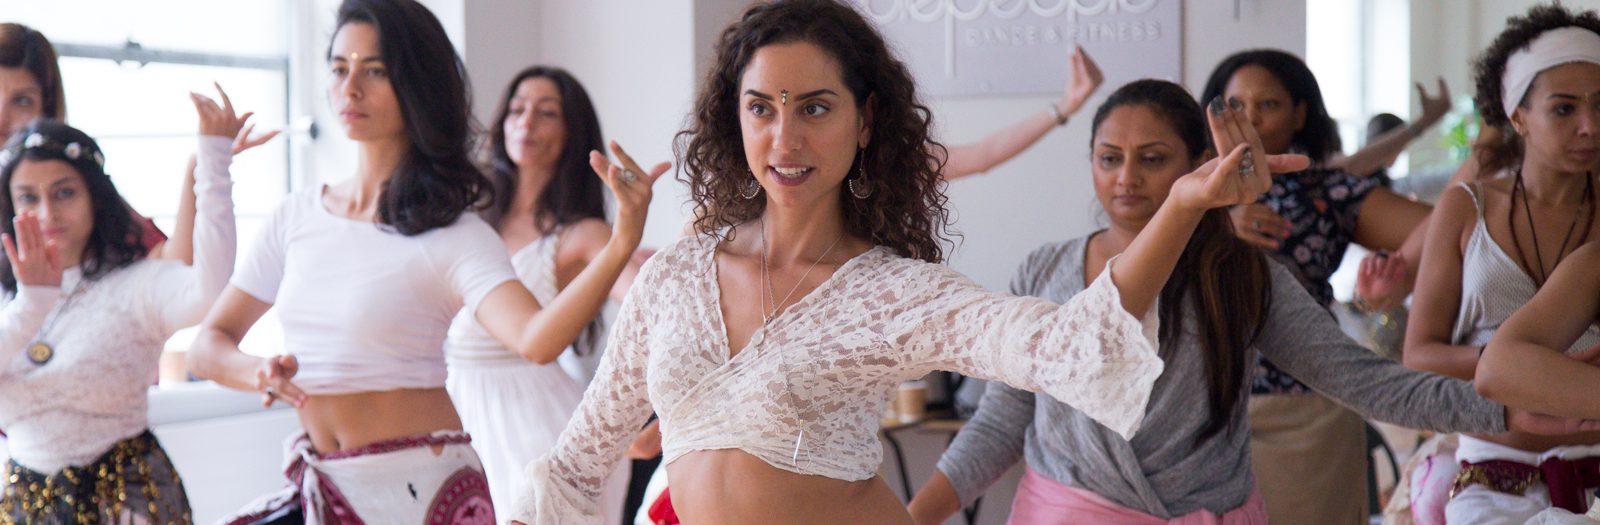 Retreats, Wellbeing & Yoga